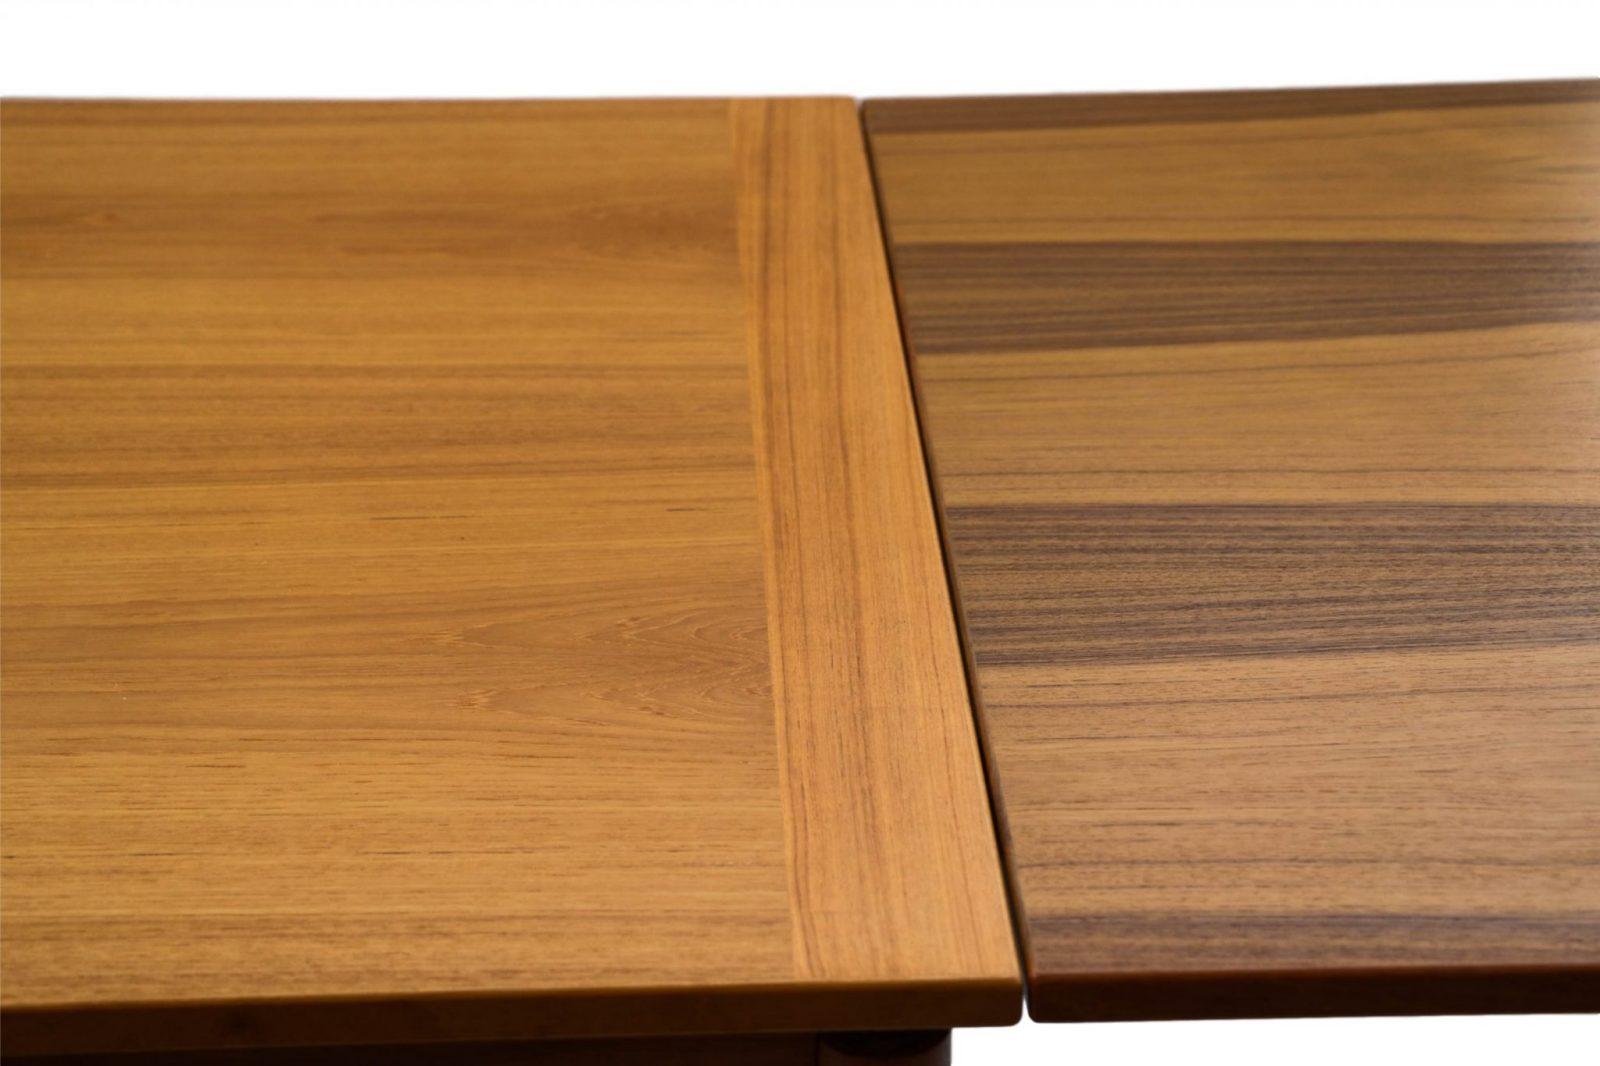 Danish Mid Century Modern Teak Extendable Dining Table 13 Danish Modern Coffee Table Danish Coffee Table In Teak Room Of Art